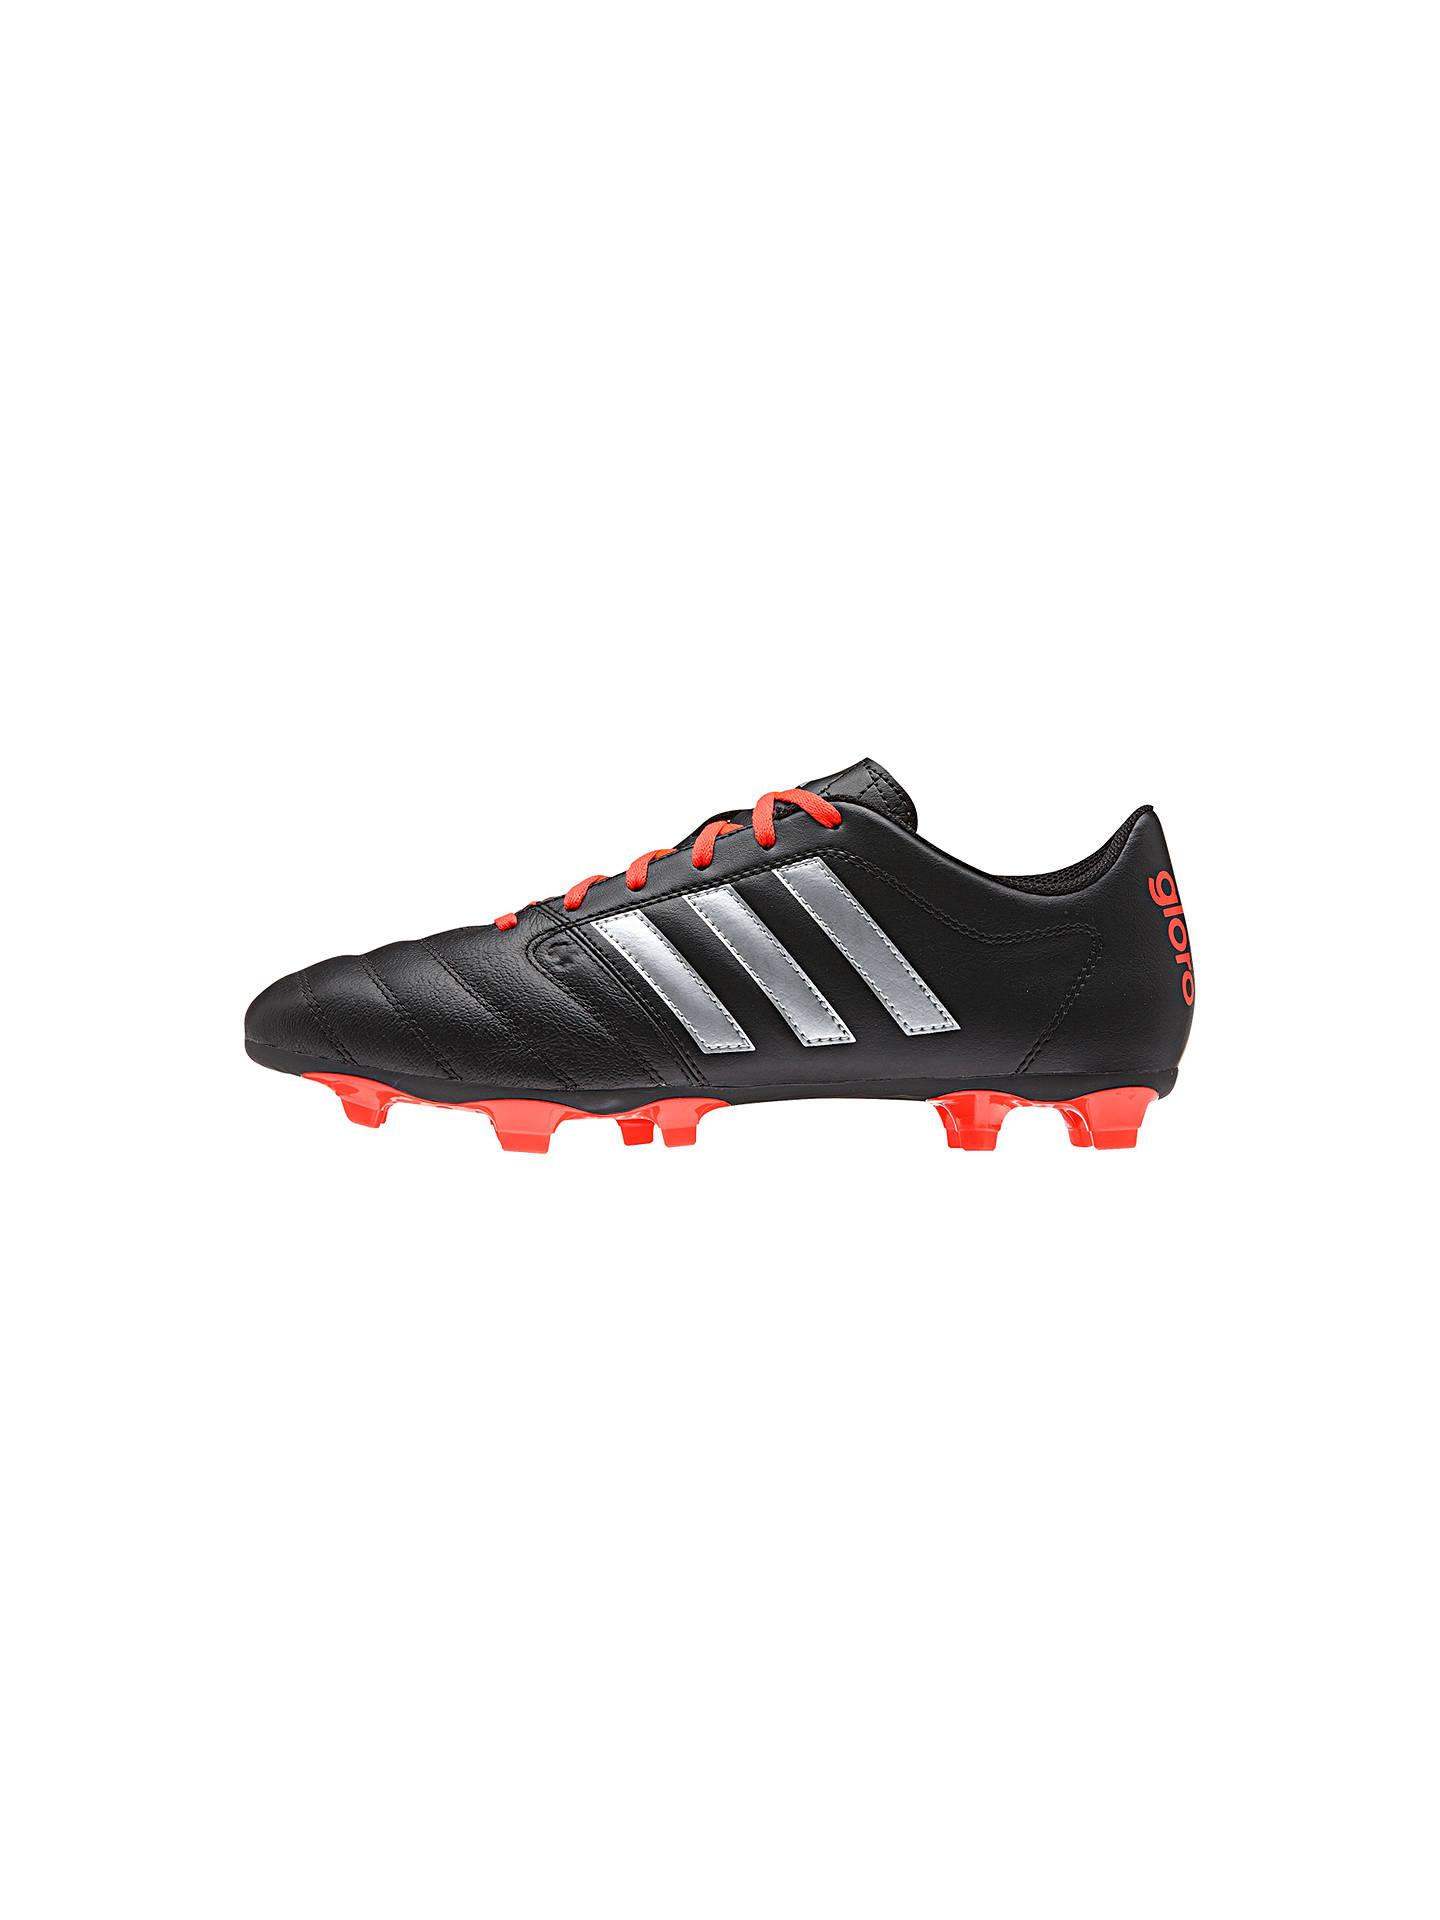 07ae94ac243f Buy Adidas Gloro 16.2 FG Men's Football Boots, Black/Multi, 7 Online at ...